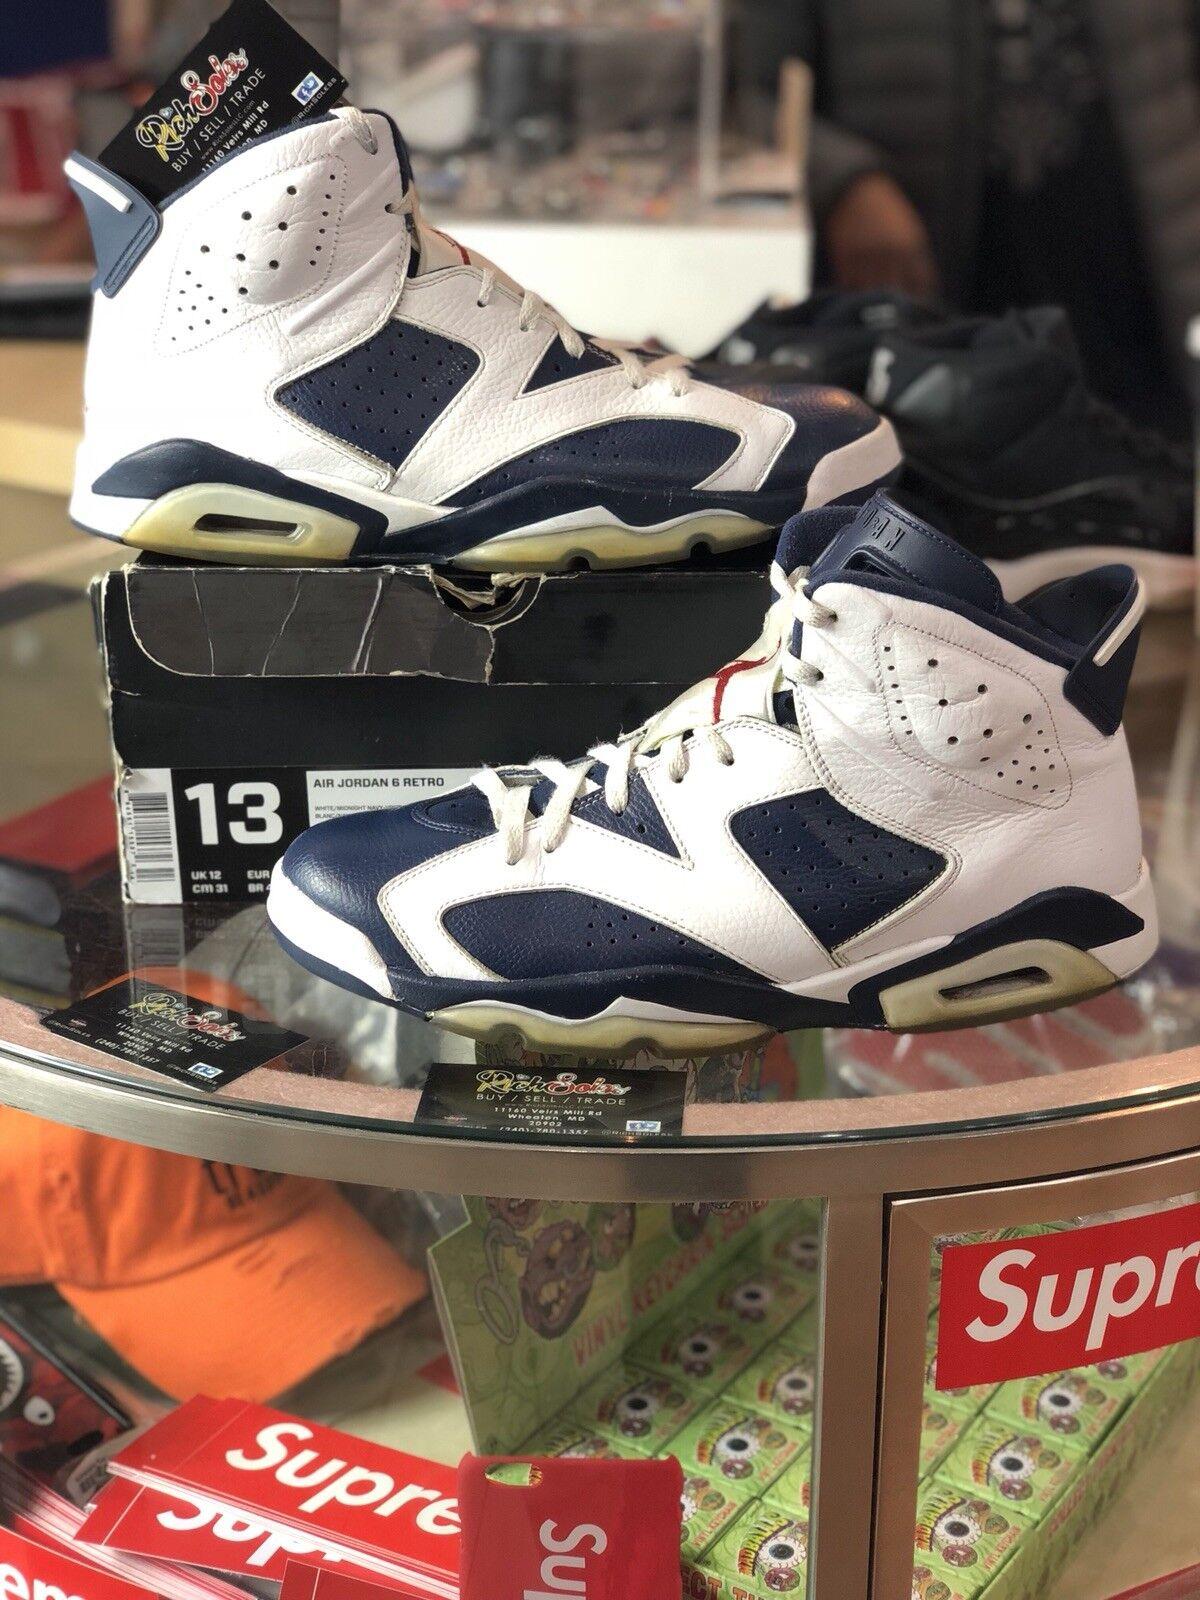 Nike Air Jordan Retro 6 VI Olympic 384664-130 Size 13